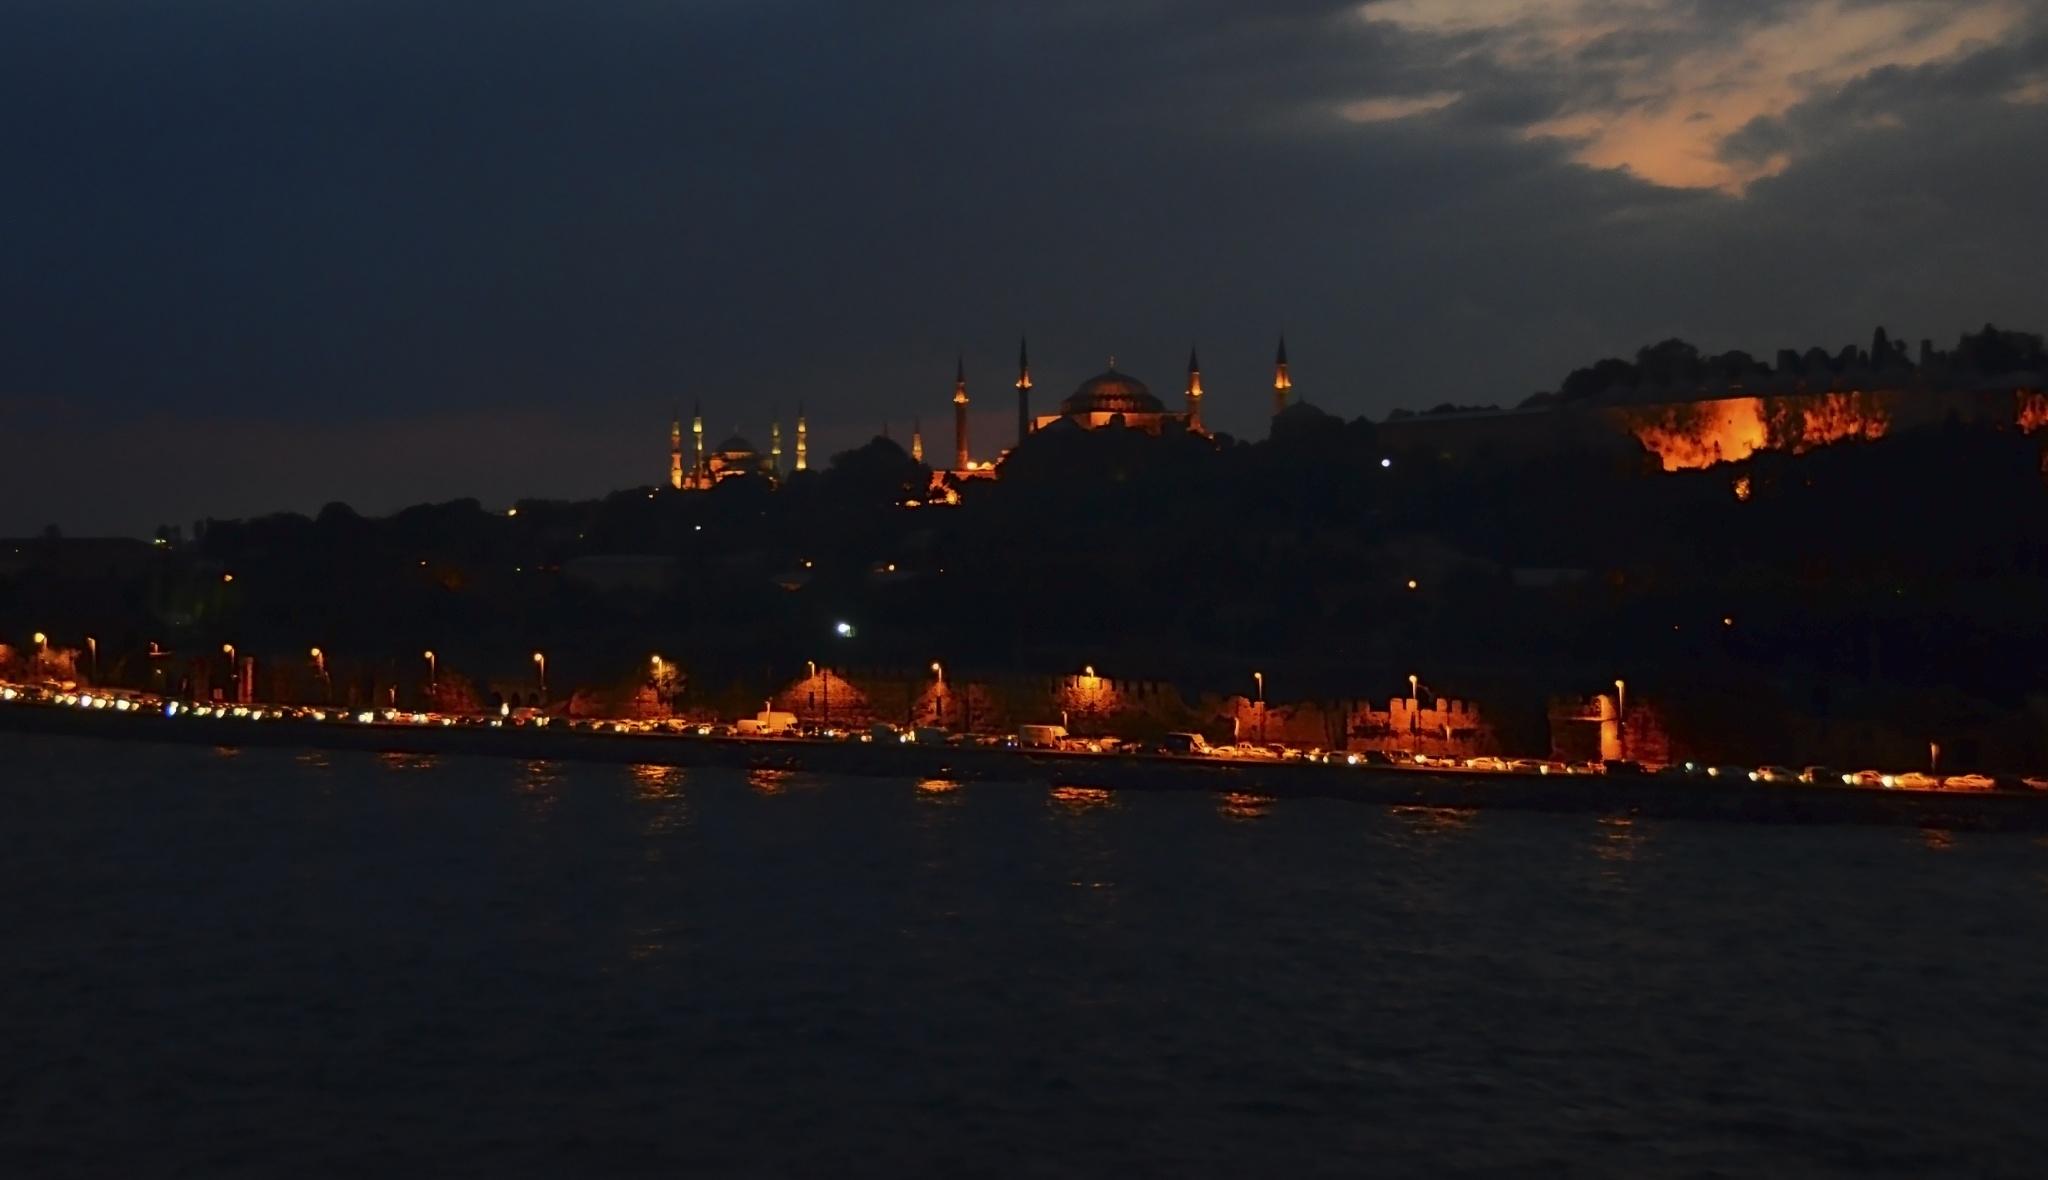 Istanbul. Night by Merle Layden